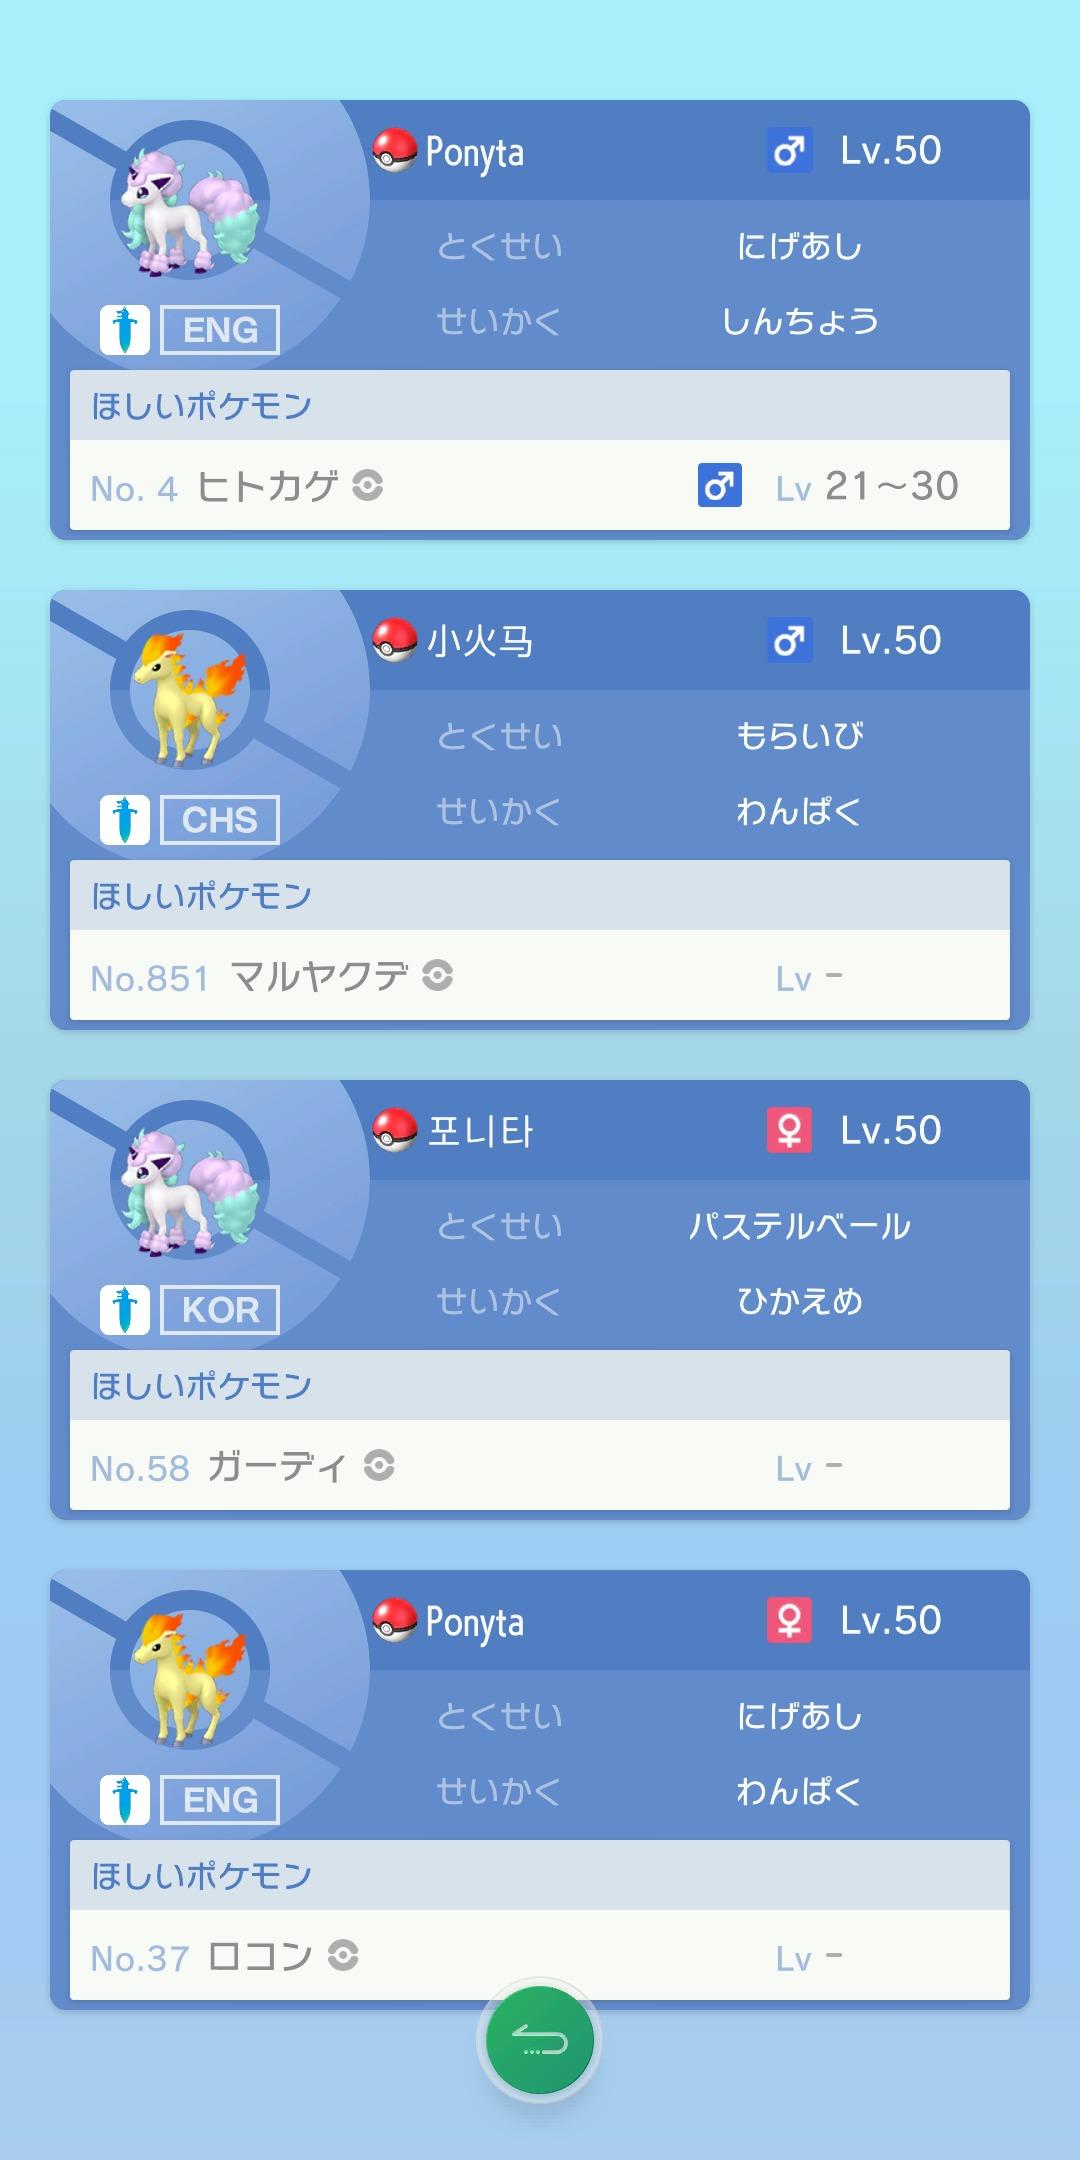 GTS3 (C)2020 Pokémon. (C)1995-2020 Nintendo/Creatures Inc. /GAME FREAK inc.